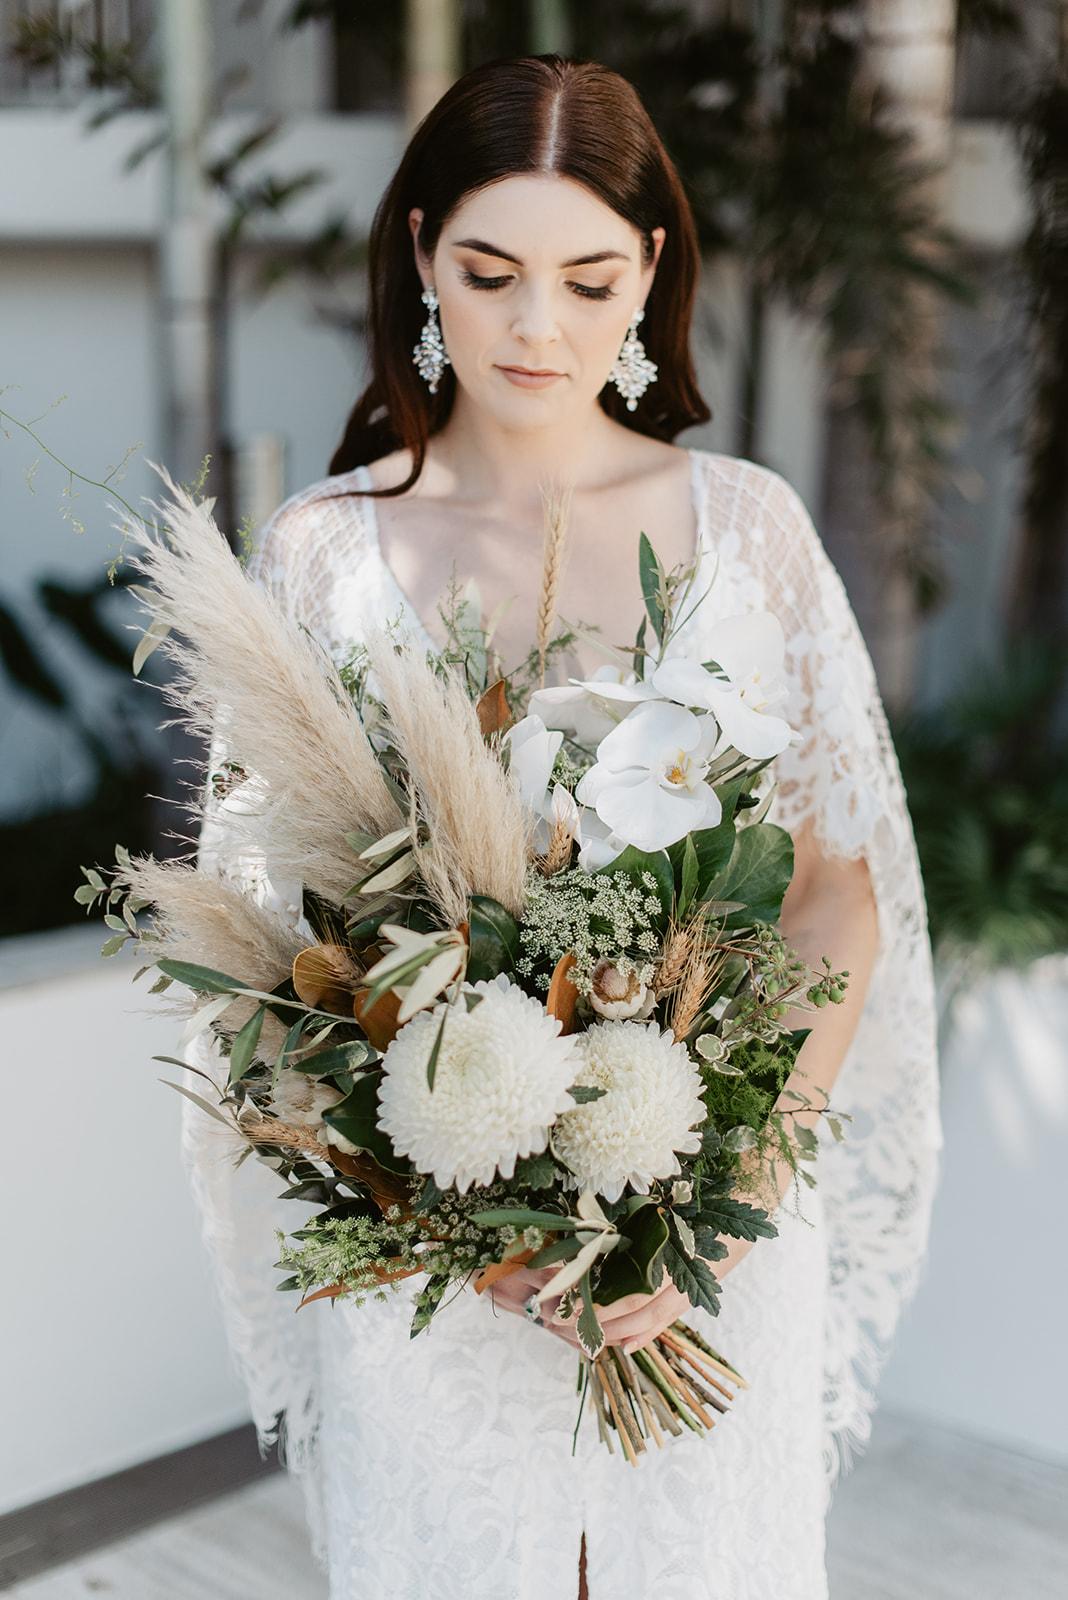 ephemeral creative photography boho weddings mackay grace loves lace floral design venue